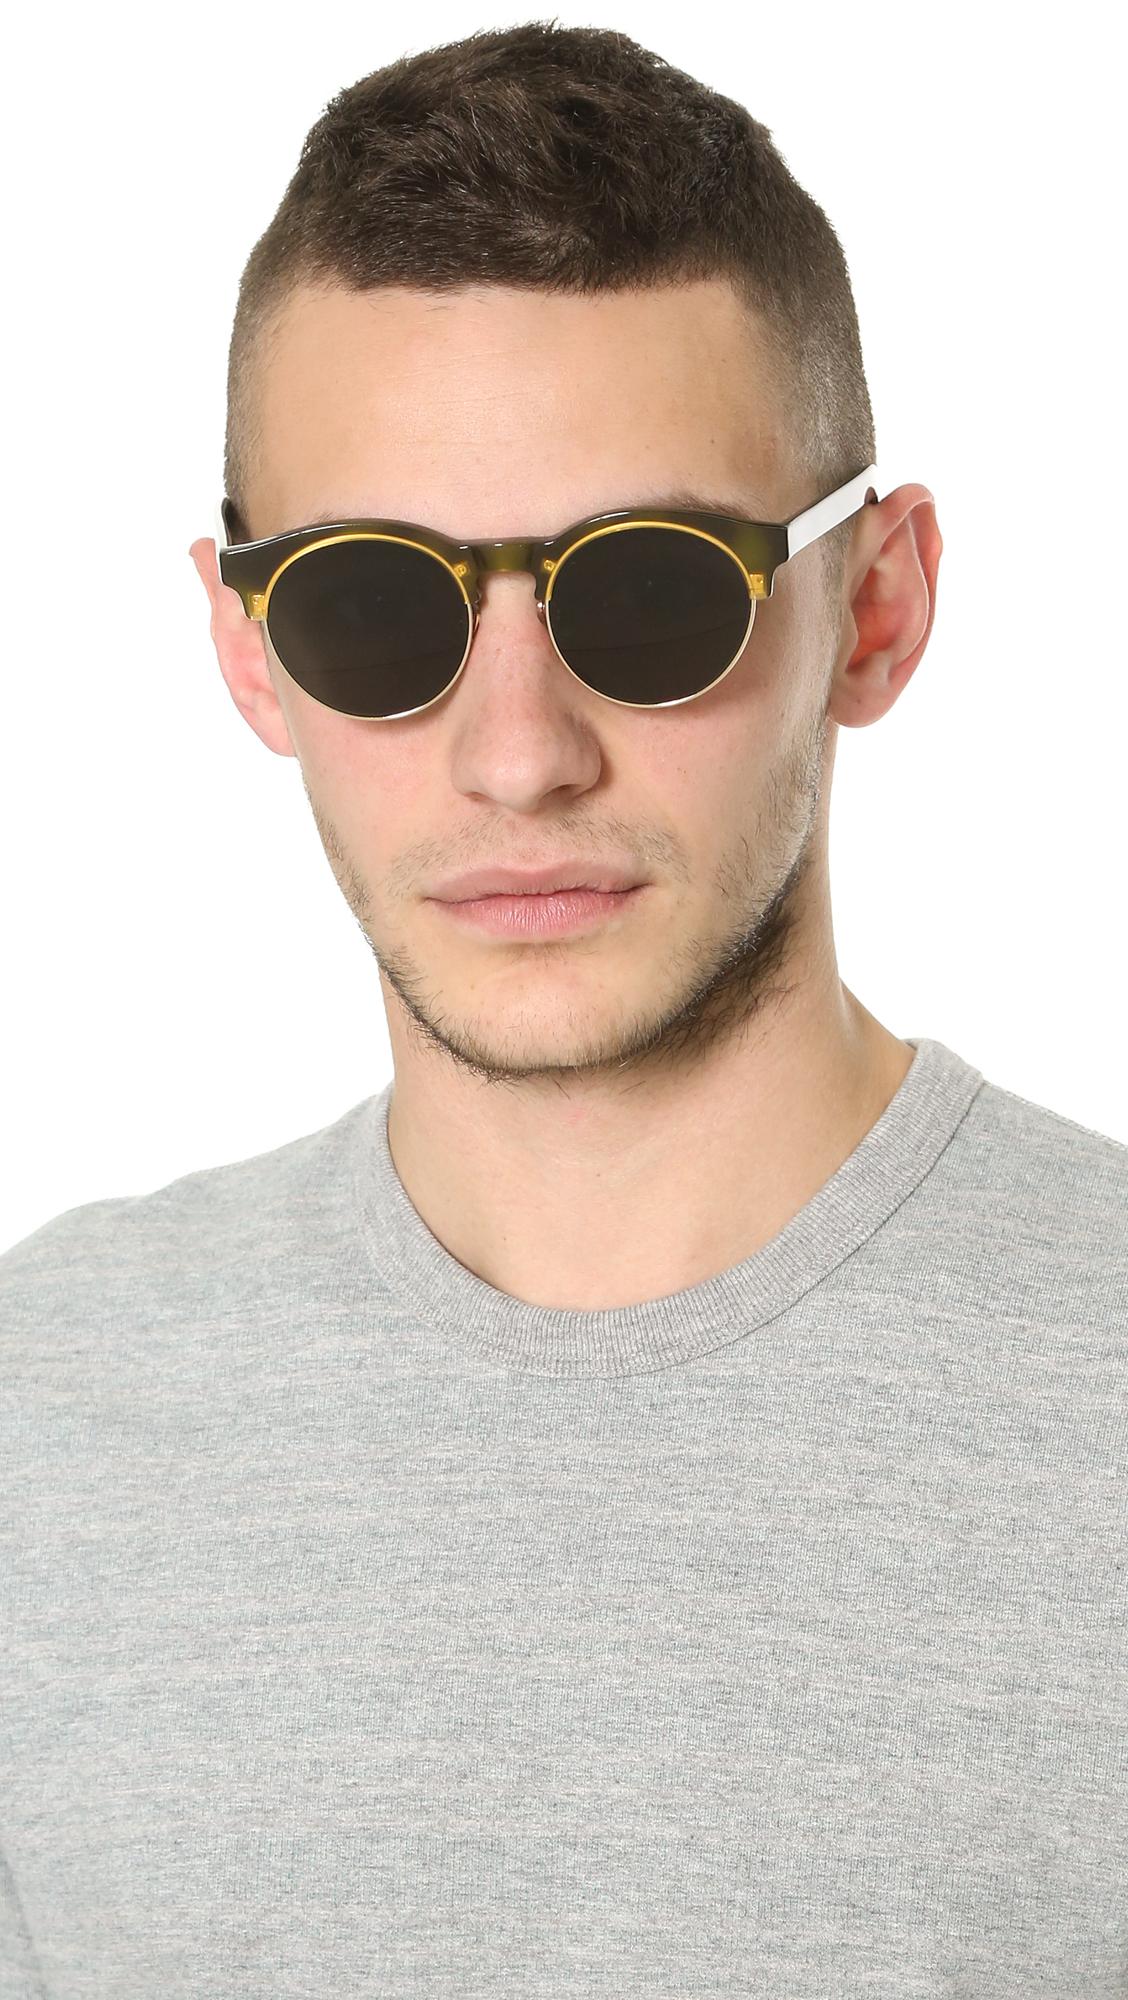 c894c21a37e Han Kjobenhavn Smith Sunglasses